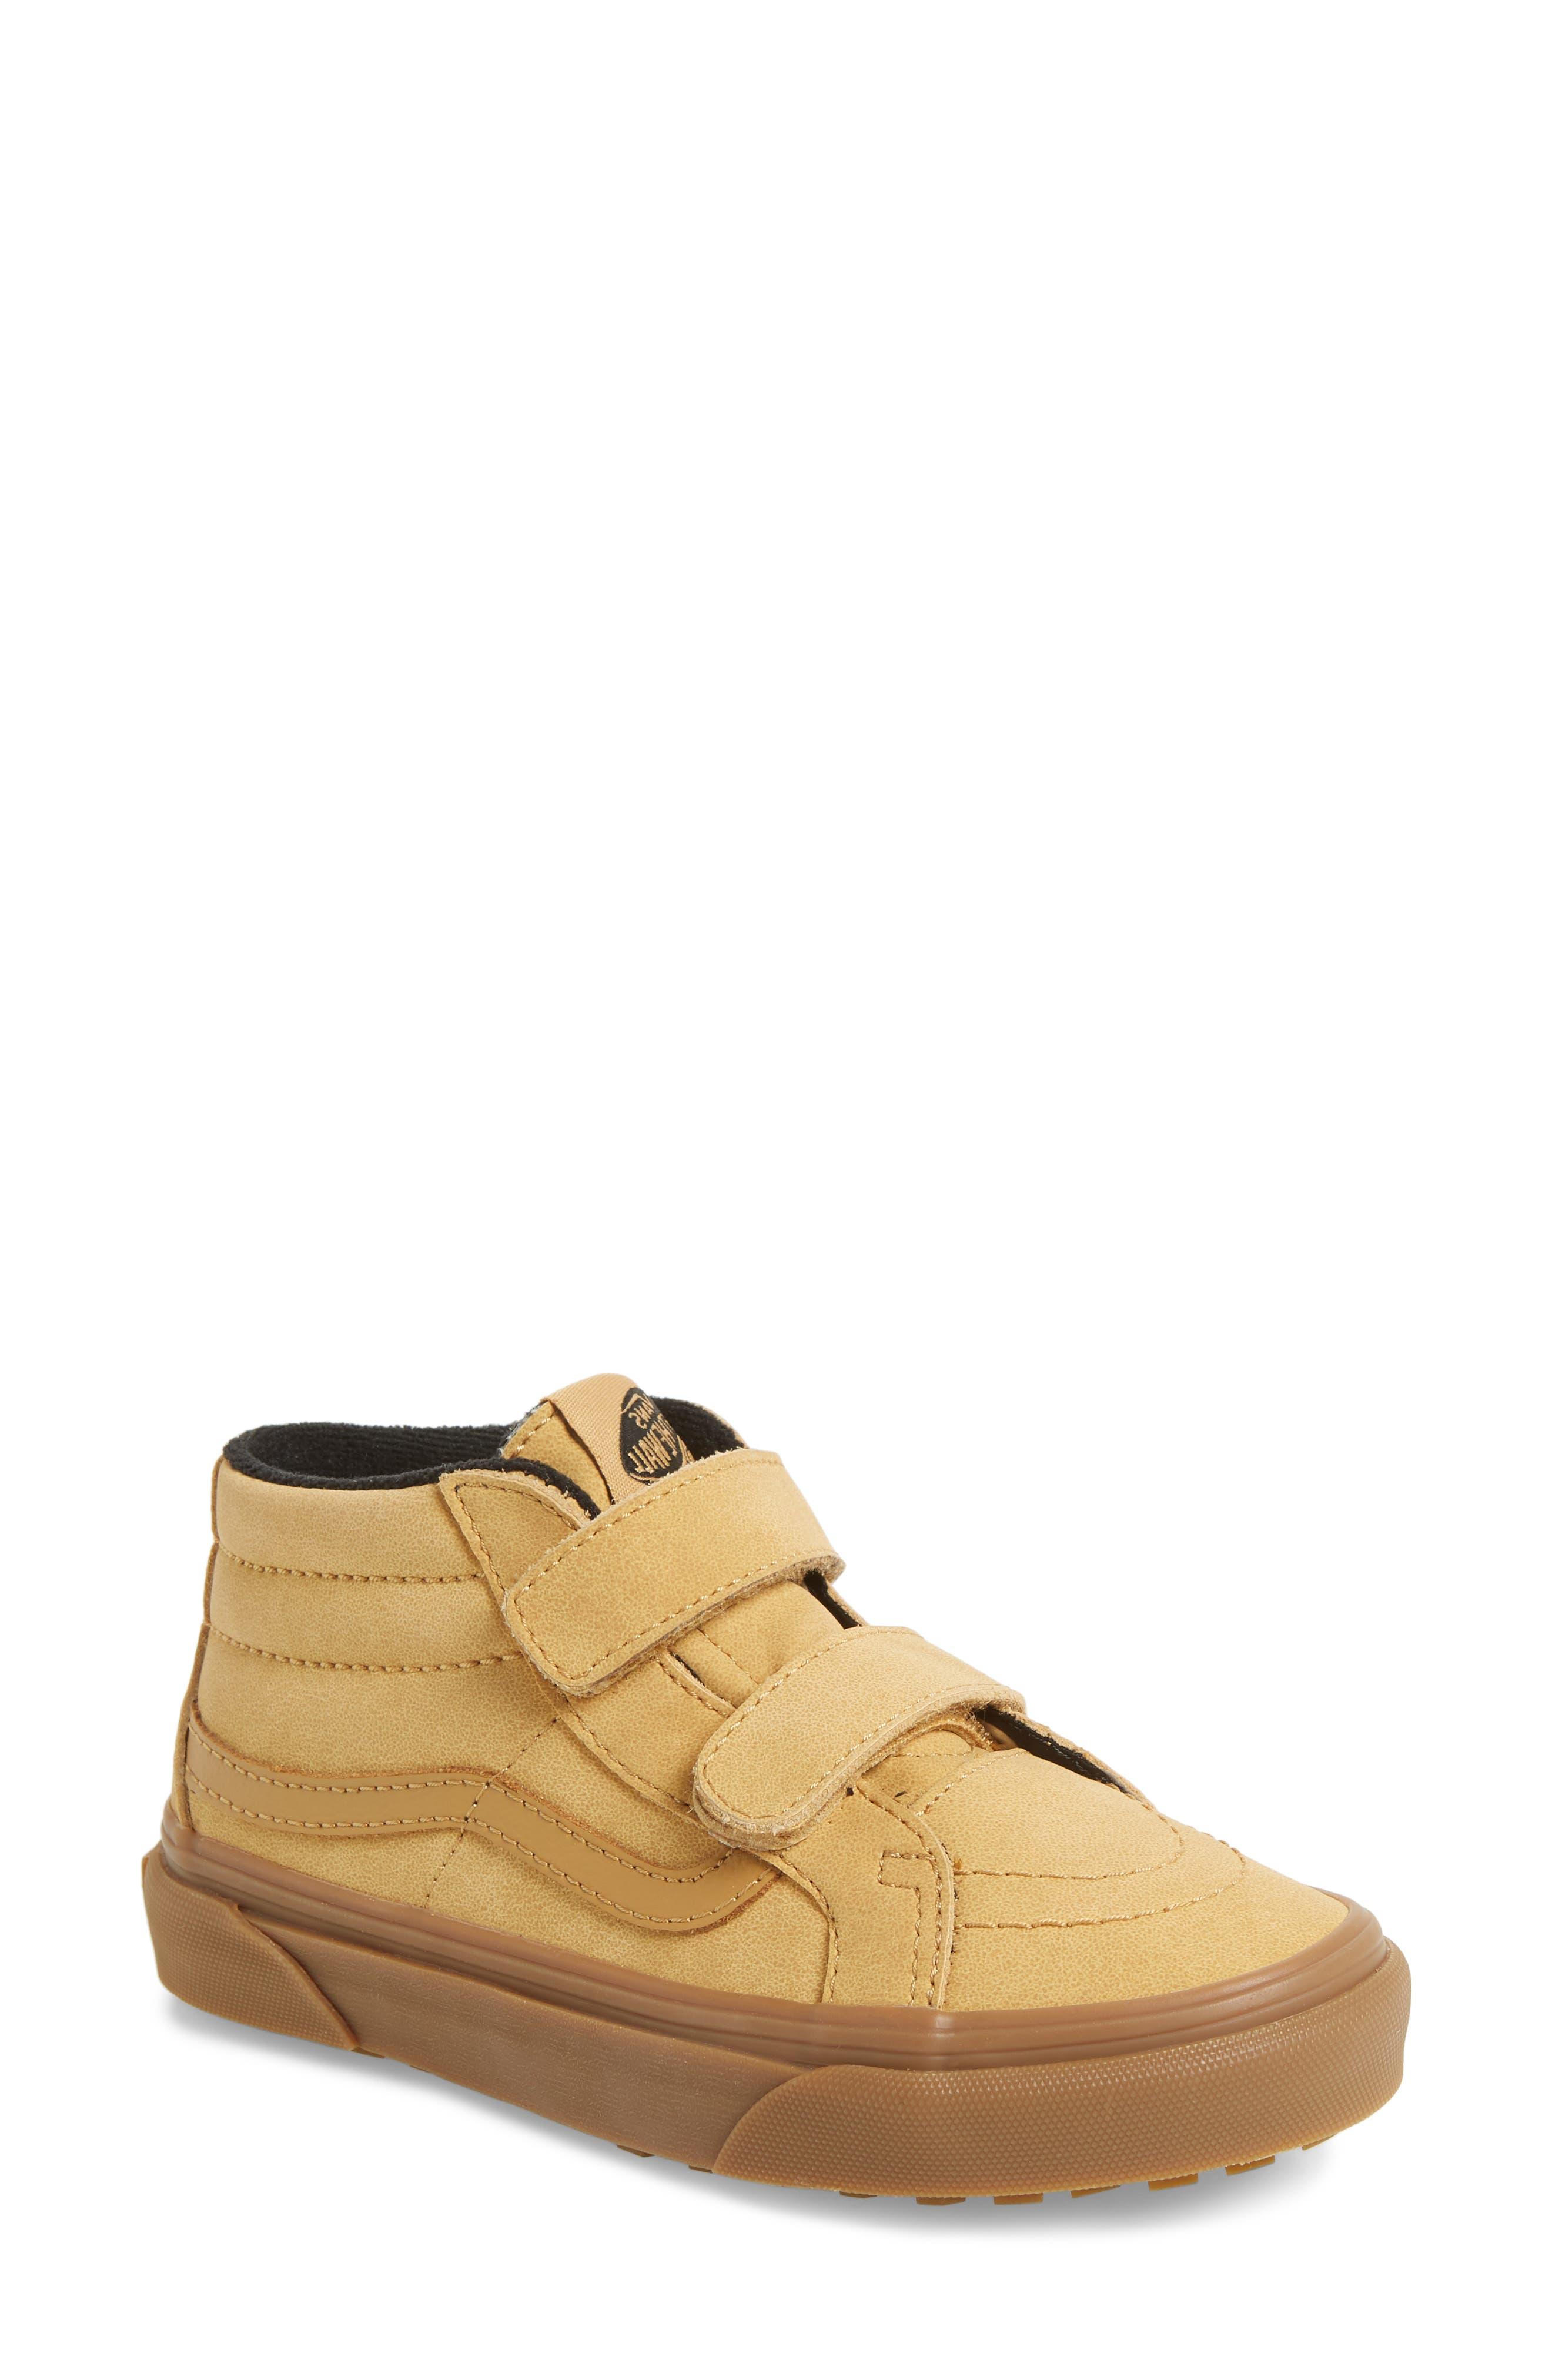 Sk8-Mid Reissue V Sneaker,                         Main,                         color, VANSBUCK/ APPLE CINNAMON